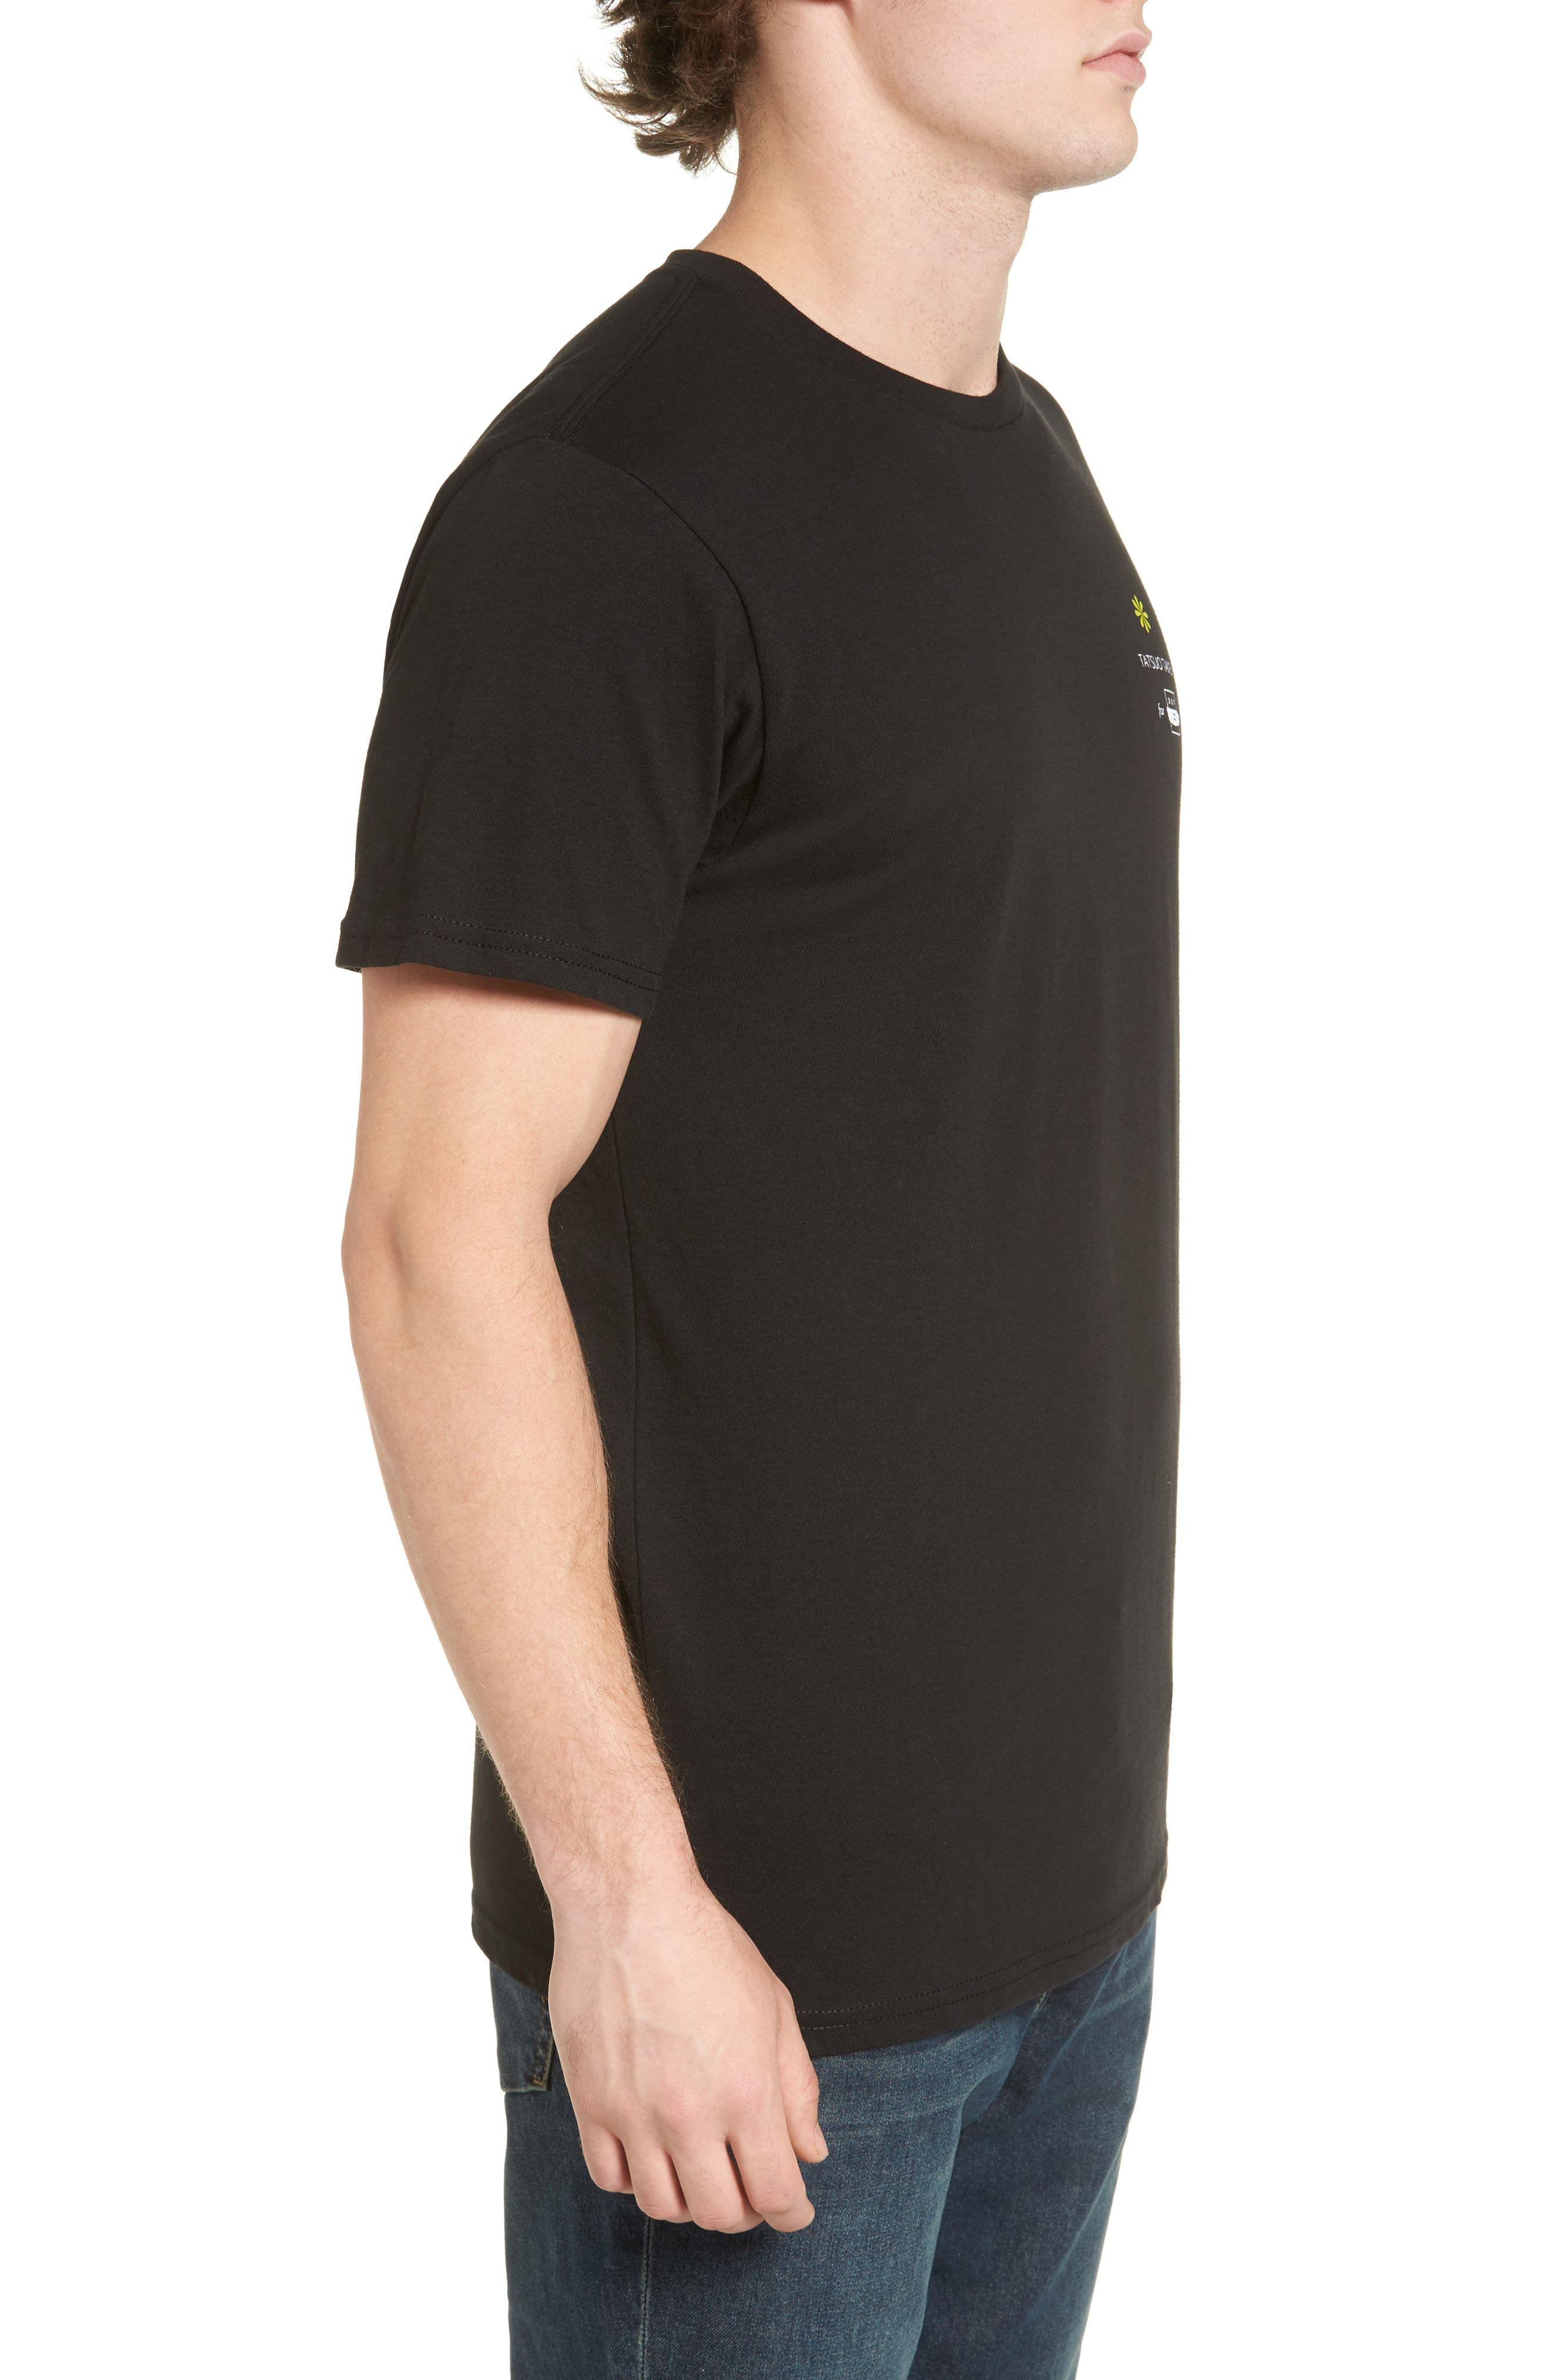 Offshore T-Shirt,                             Alternate thumbnail 3, color,                             Black